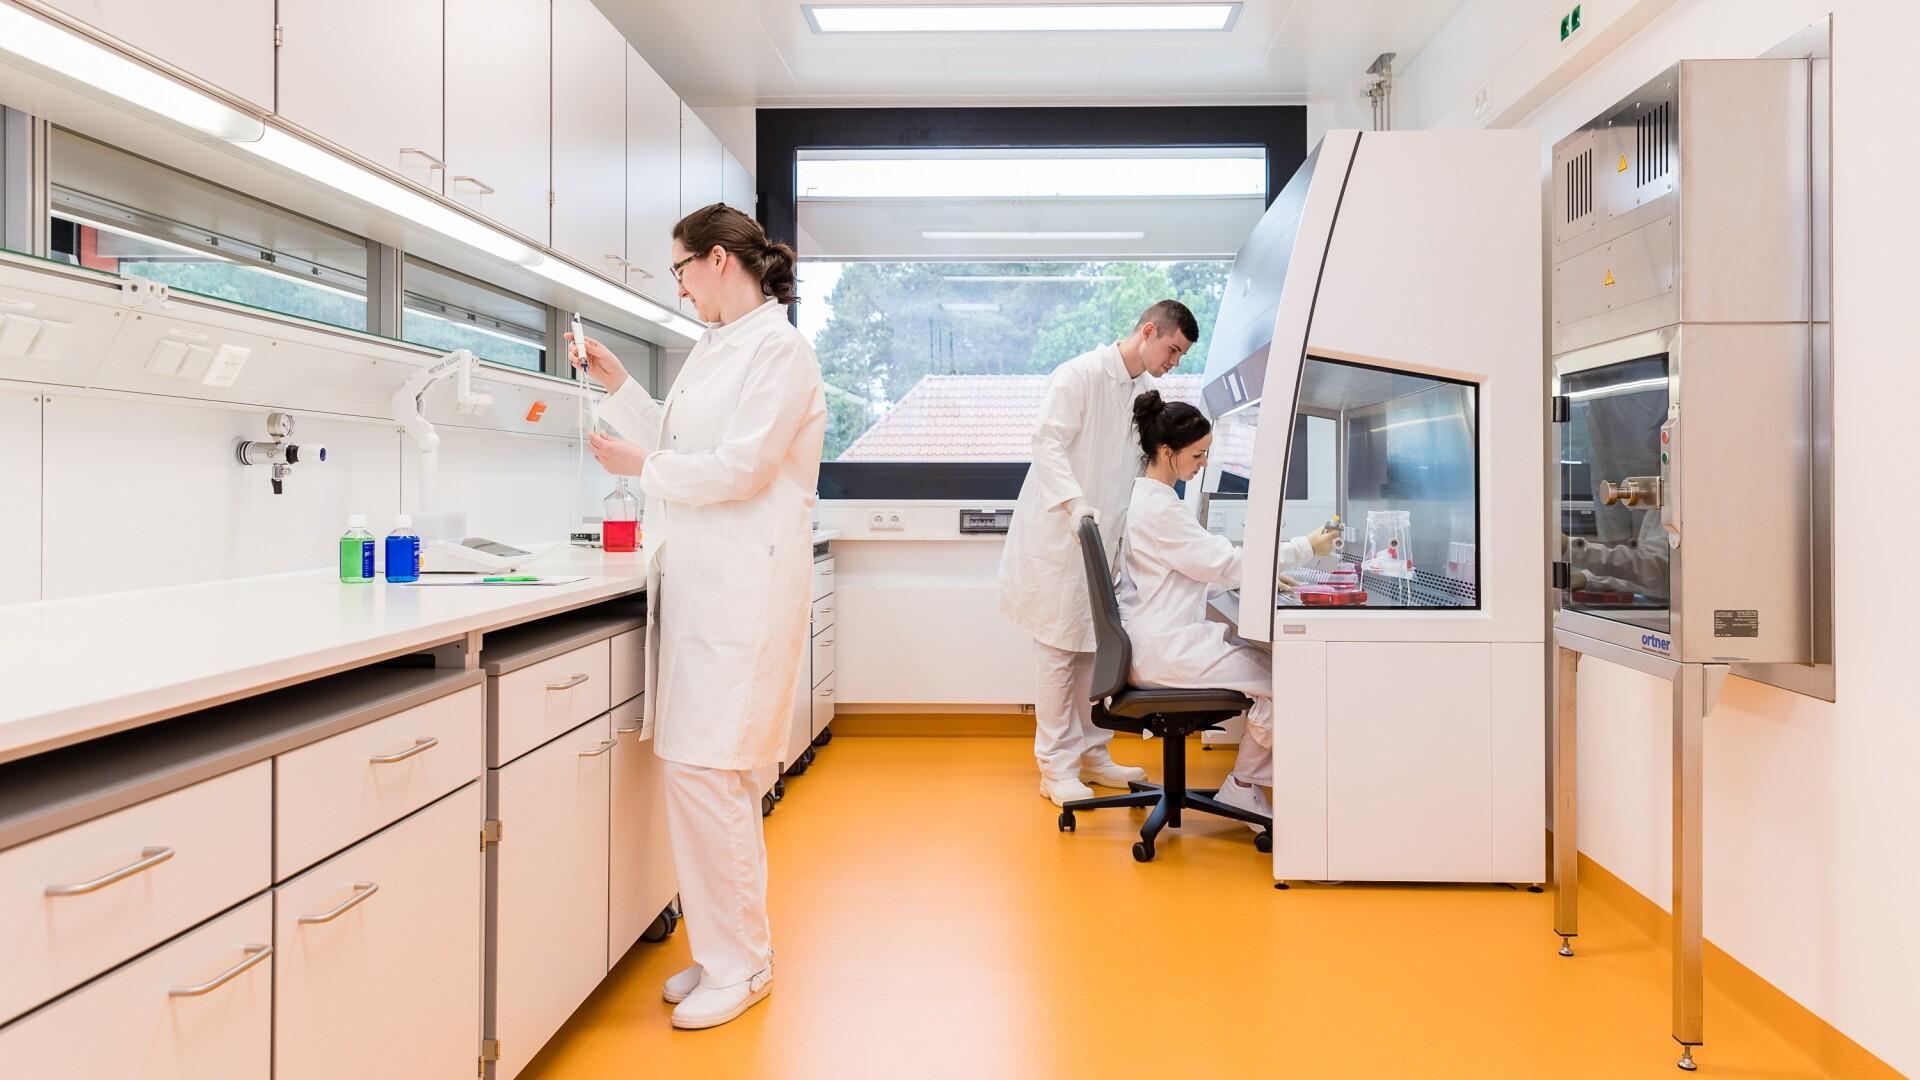 Virologisches Labor im Forschungsgebäude